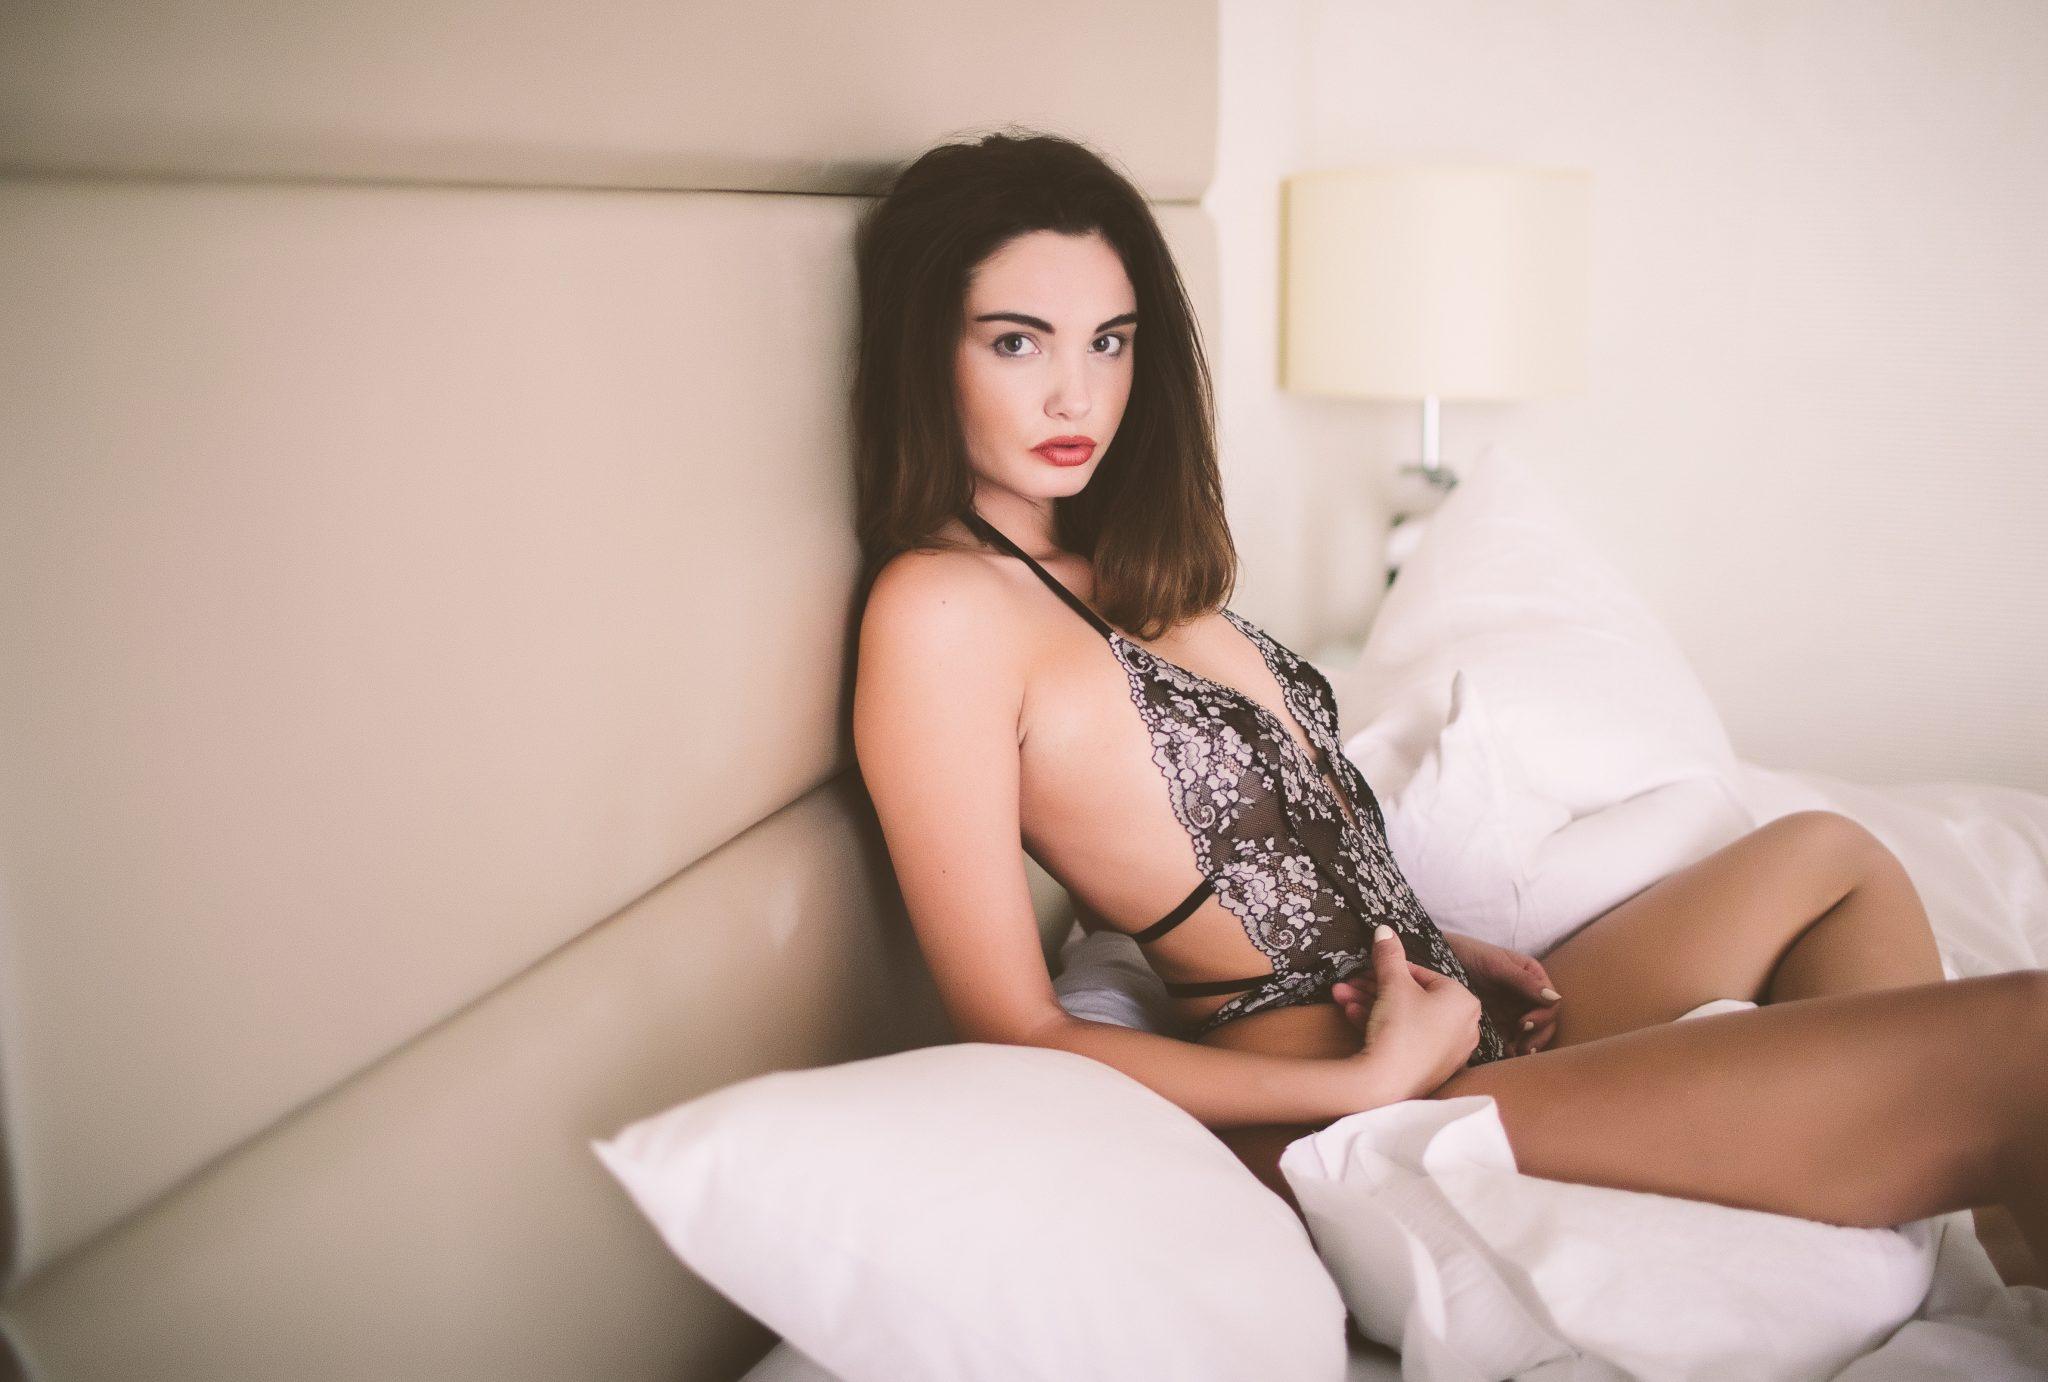 A serious shot at a sensual photo session